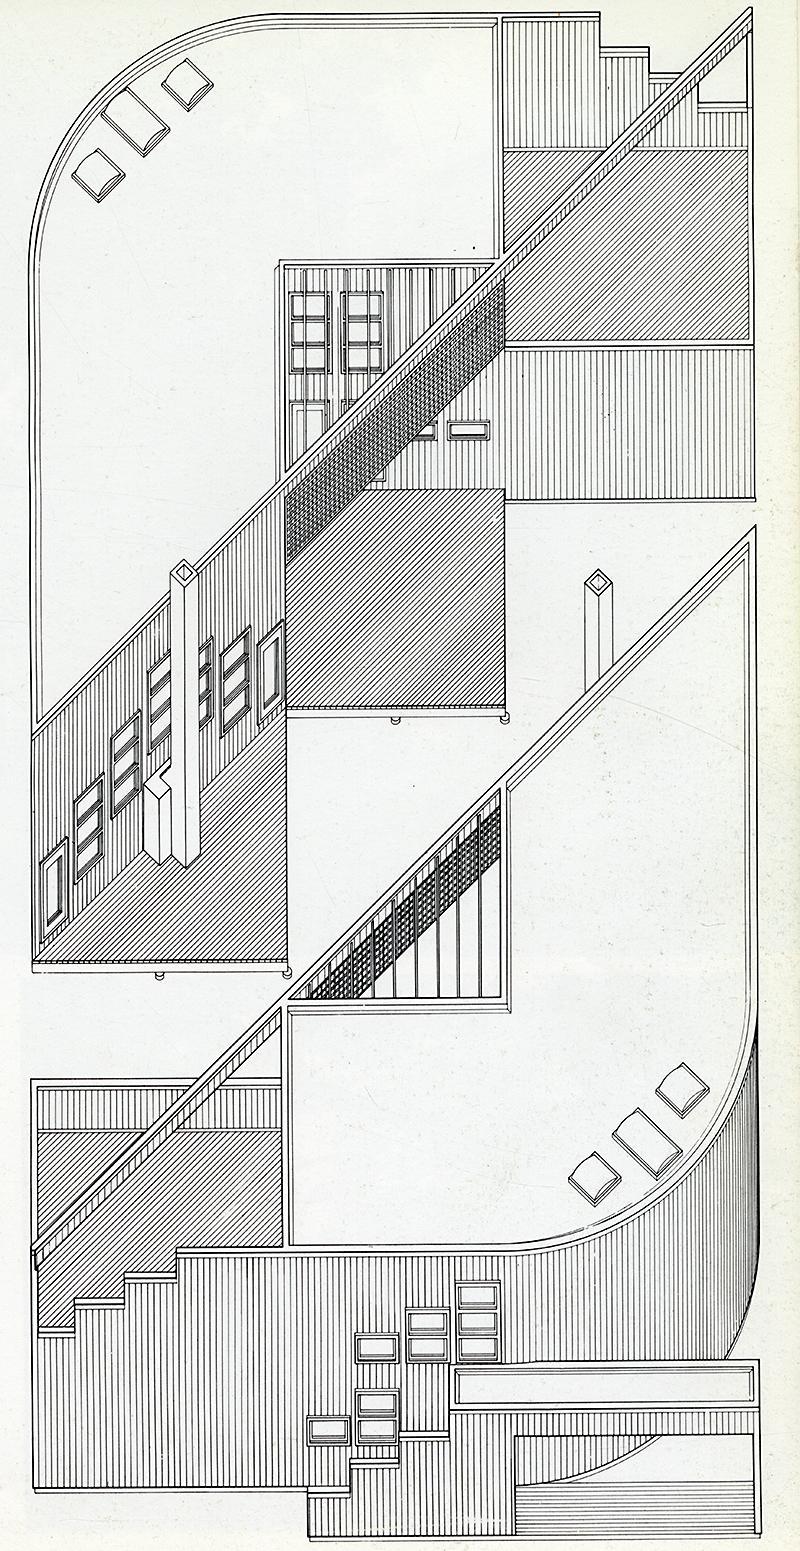 Stanley Tigerman. GA Houses. 6 1979, 45